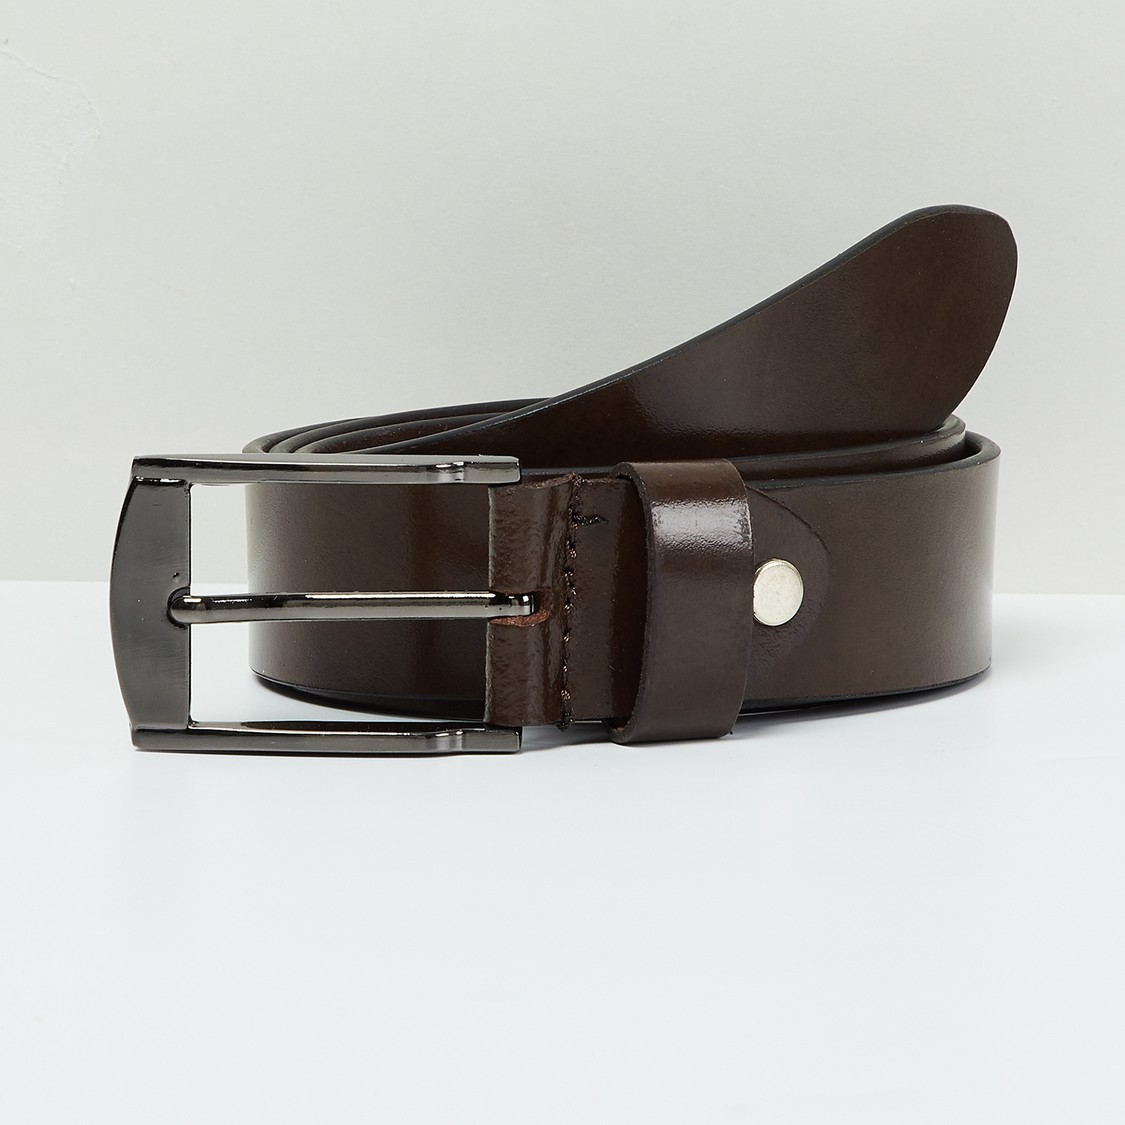 MAX Genuine Leather Solid Formal Belt